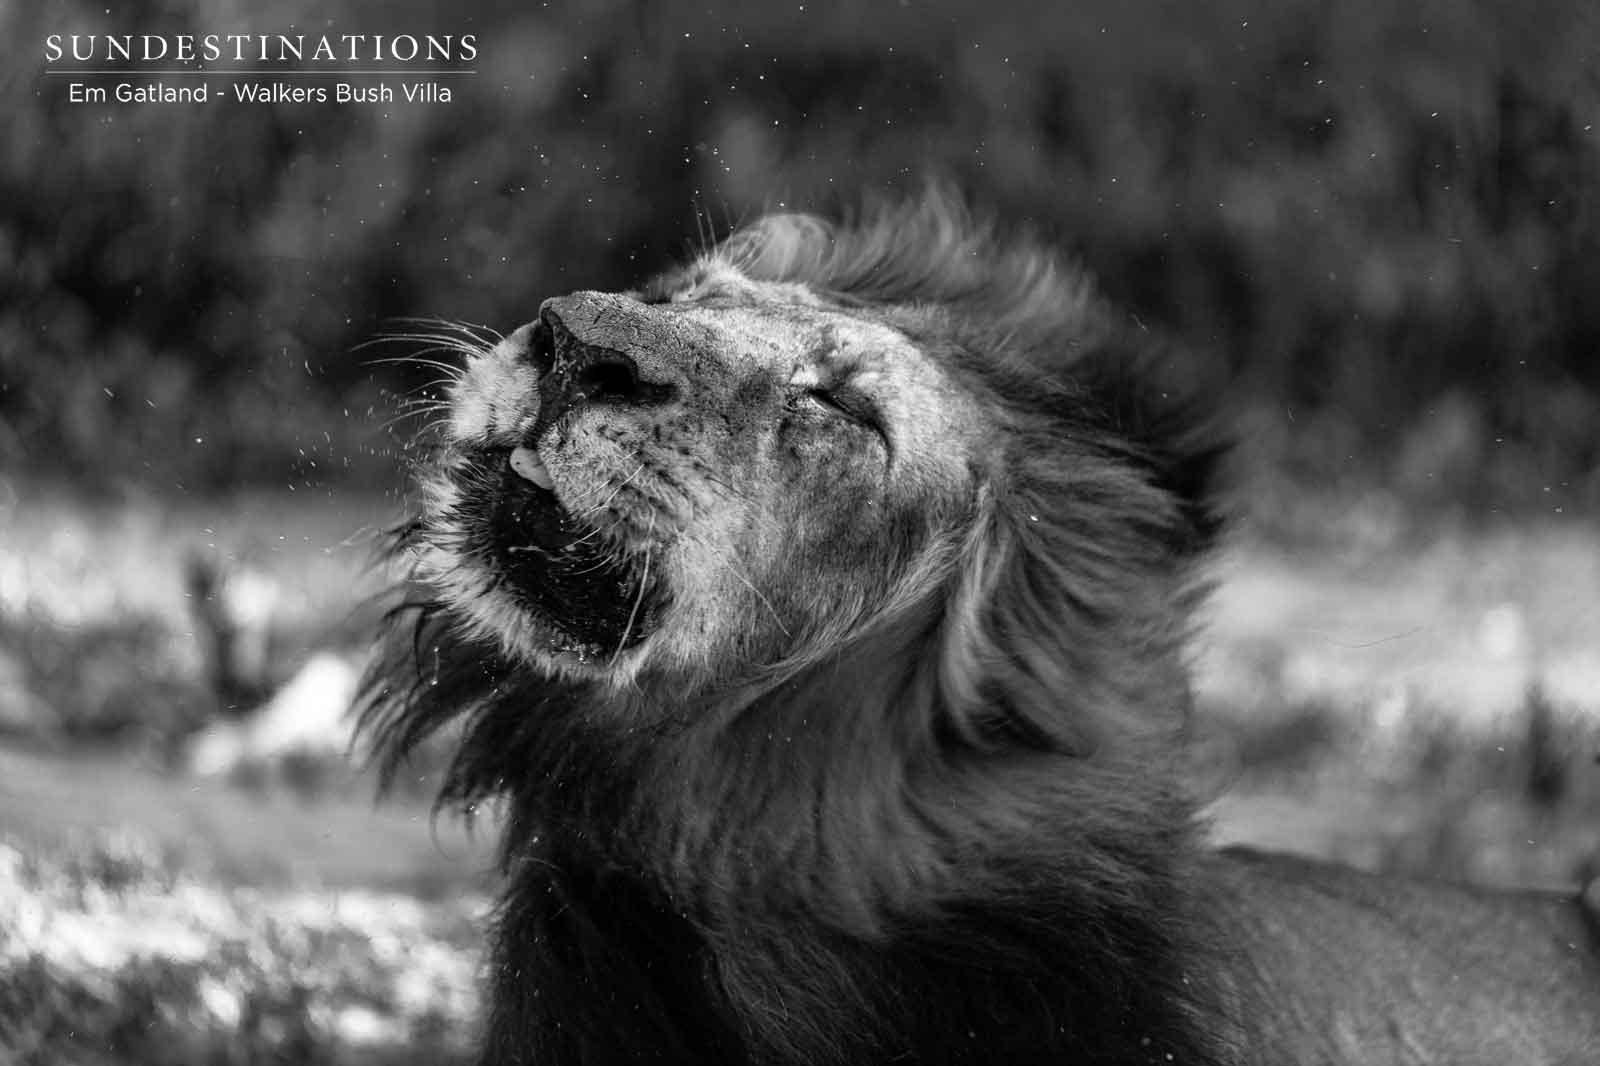 Black Dam Lion at Walkers Bush Villa